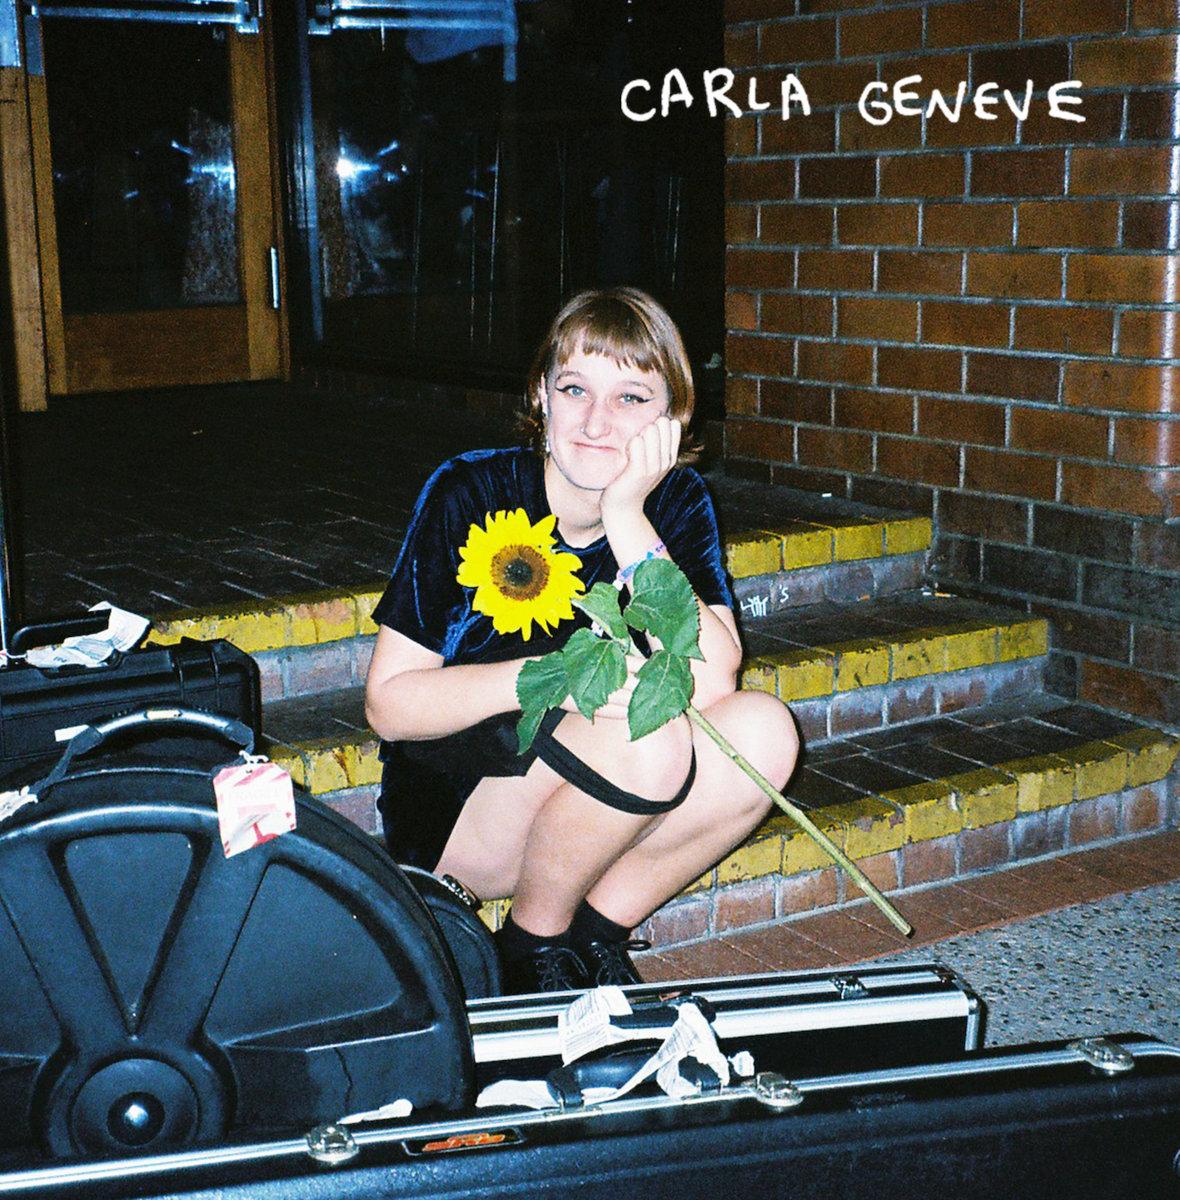 Carla Geneve - s/t LP